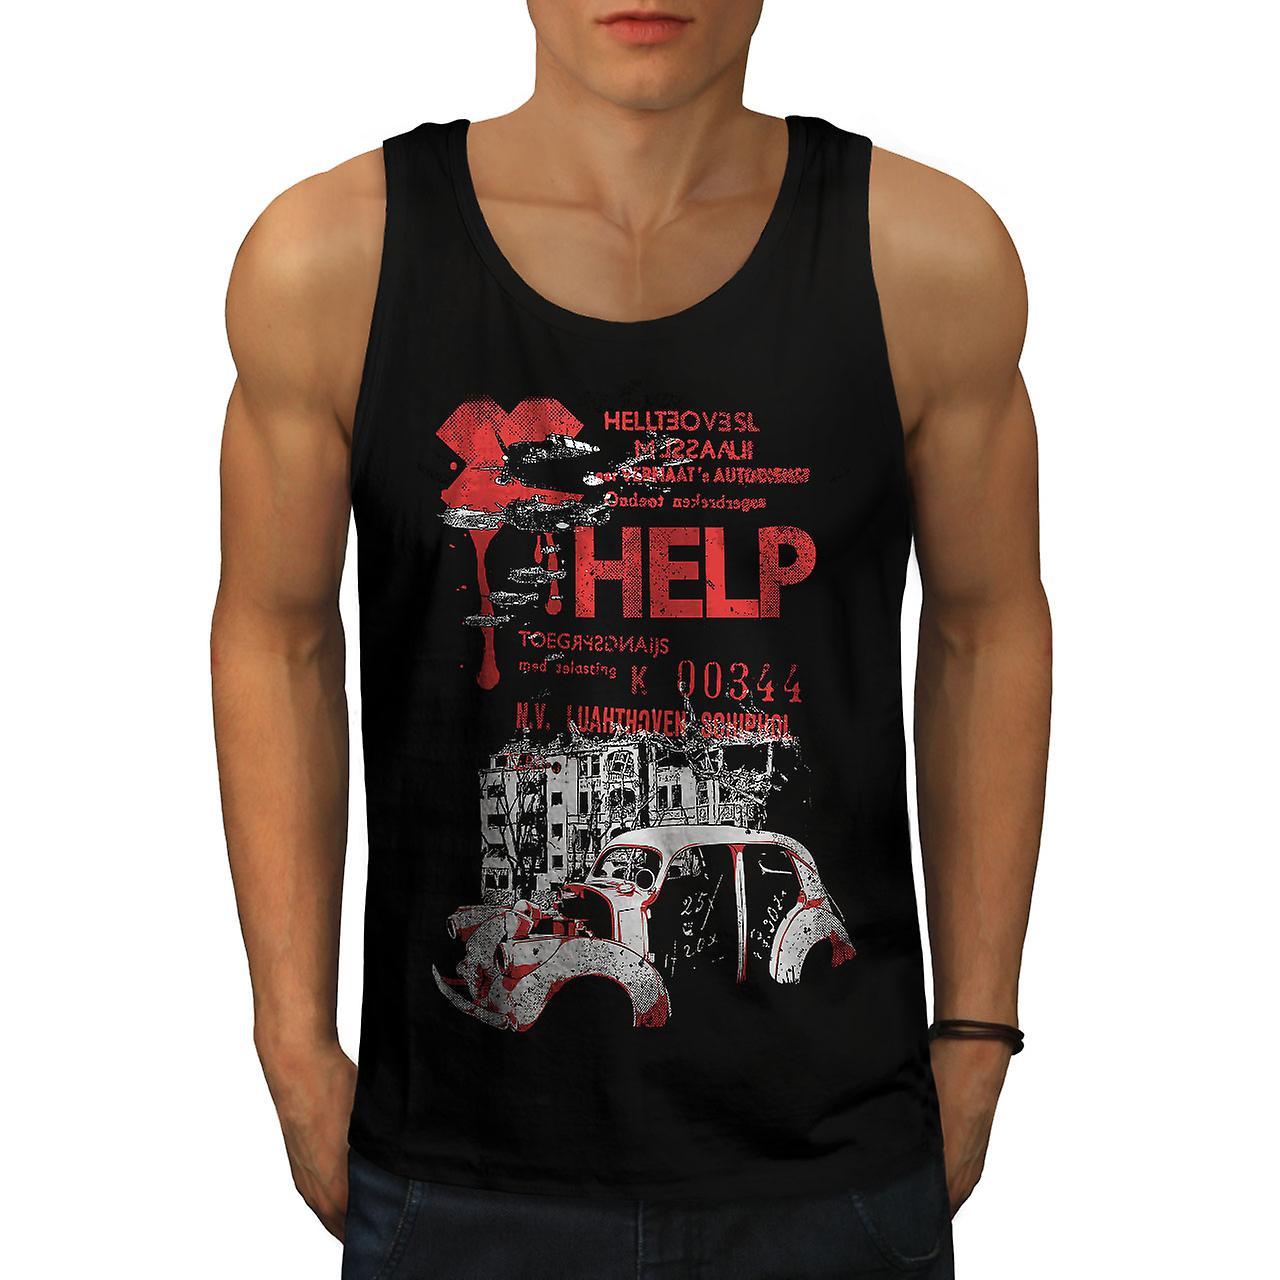 Help Hell City Fashion Men BlackTank Top | Wellcoda